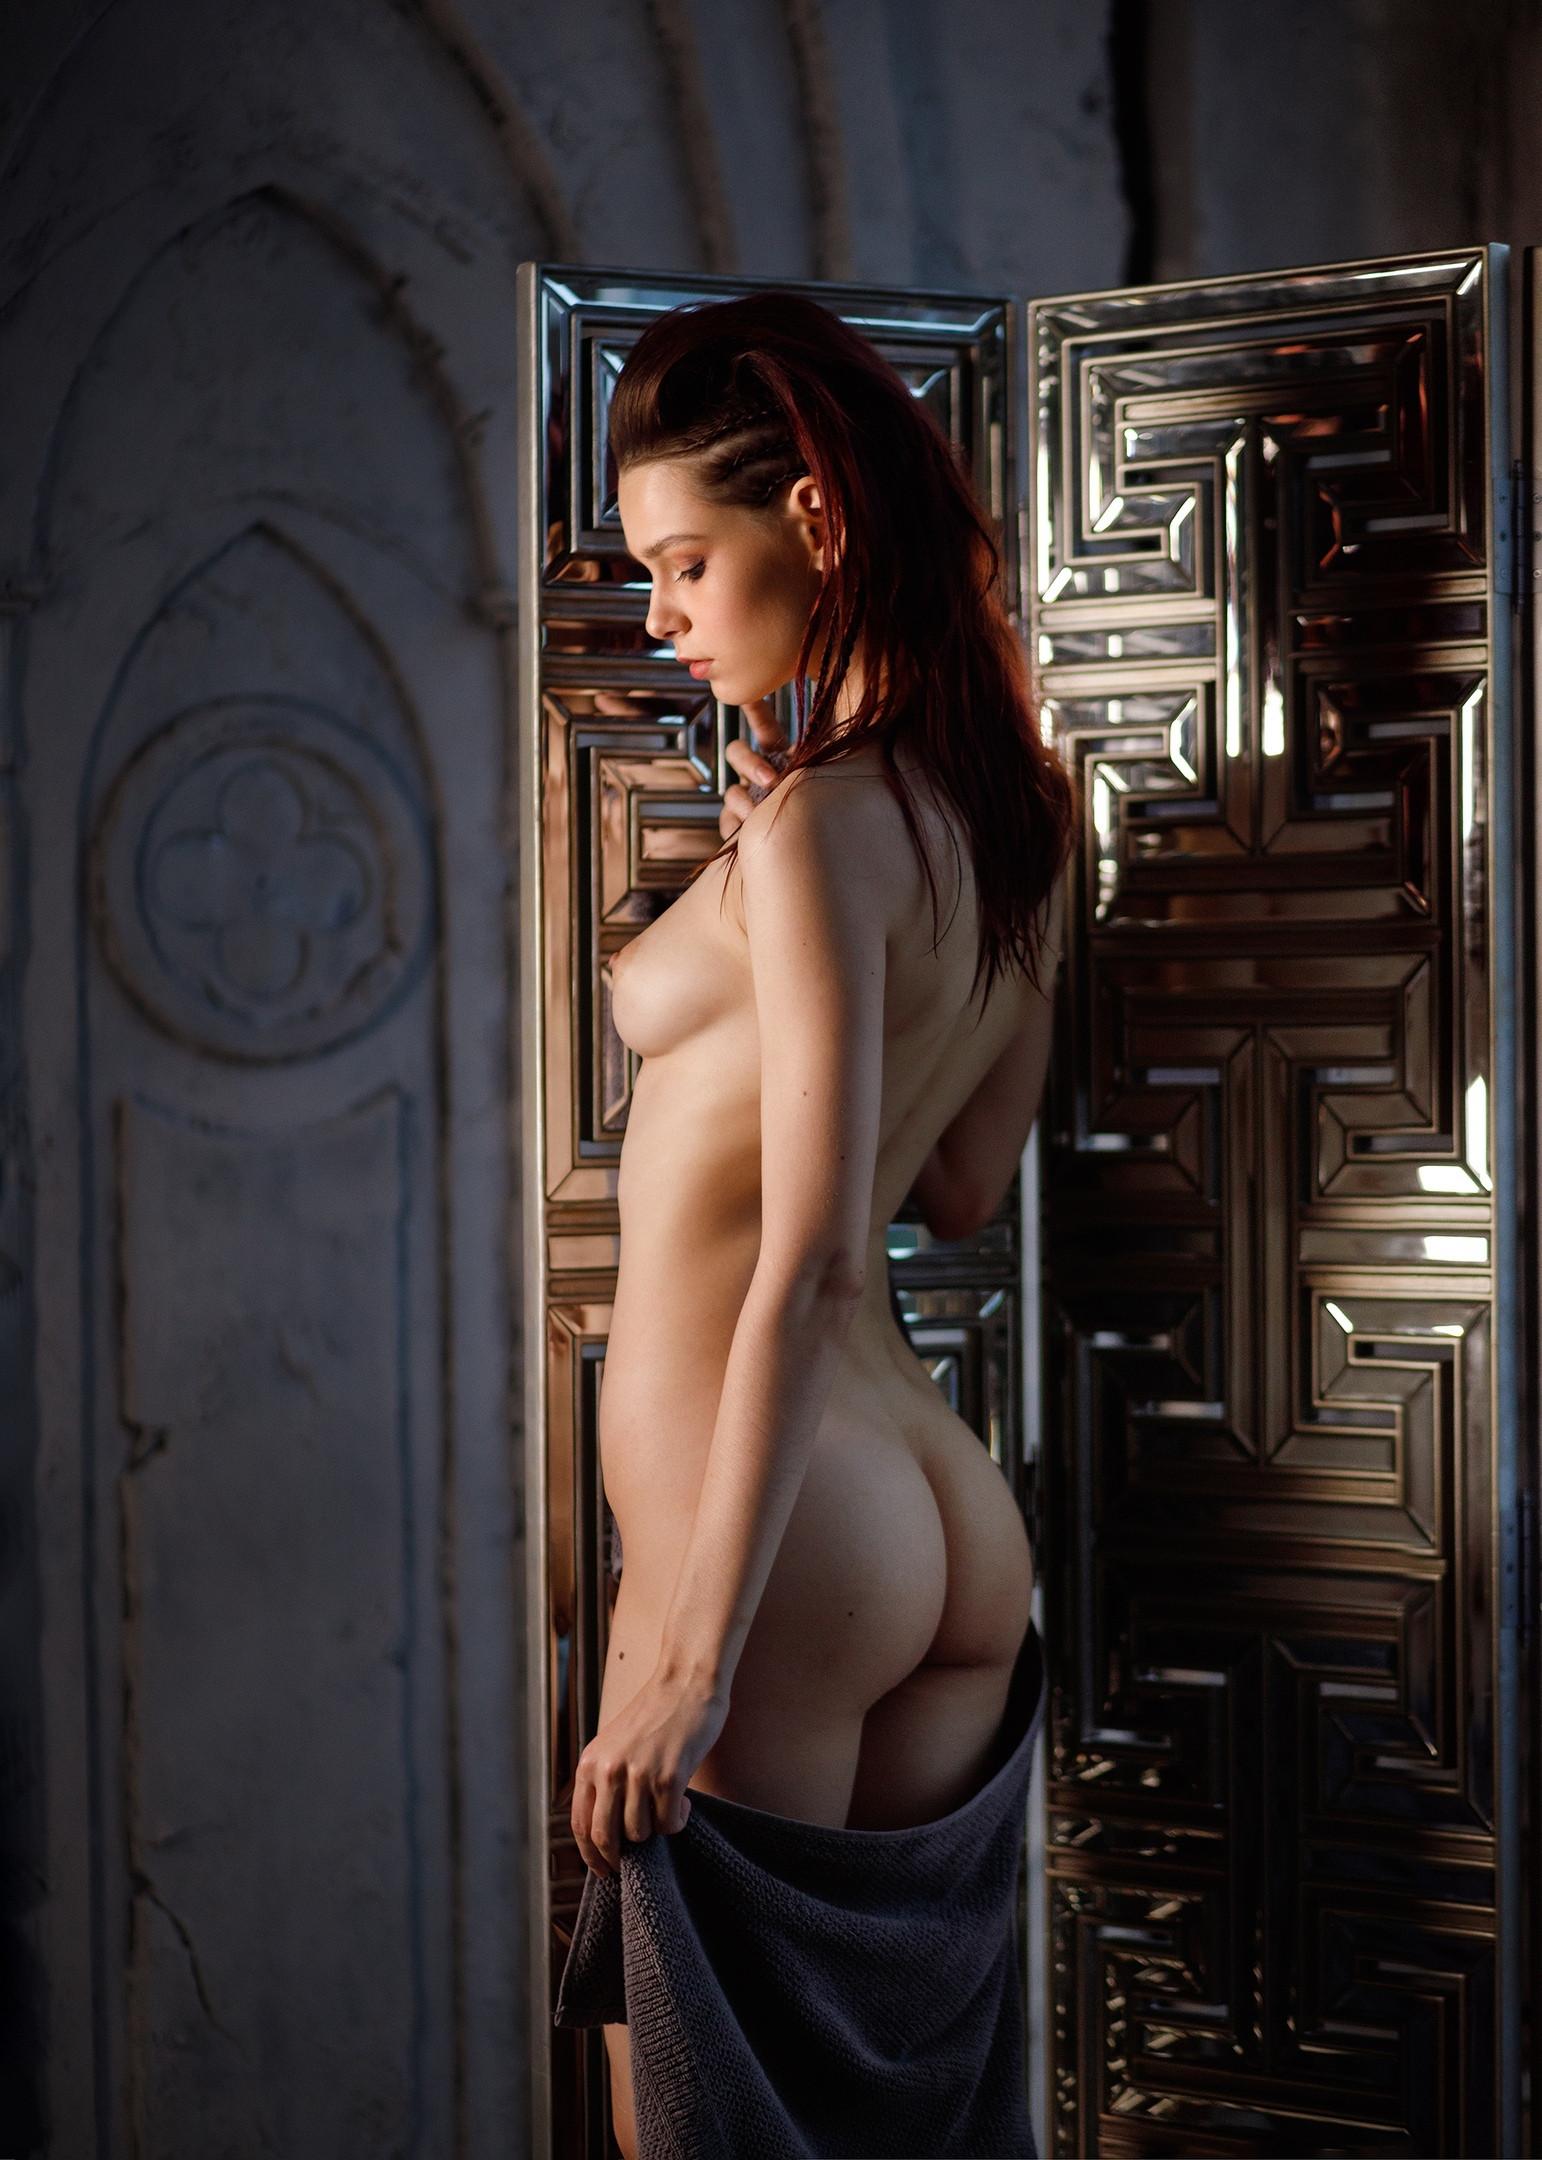 Irina Telicheva by Margarita Relina Kovalev Nikita 14 fappenings.com